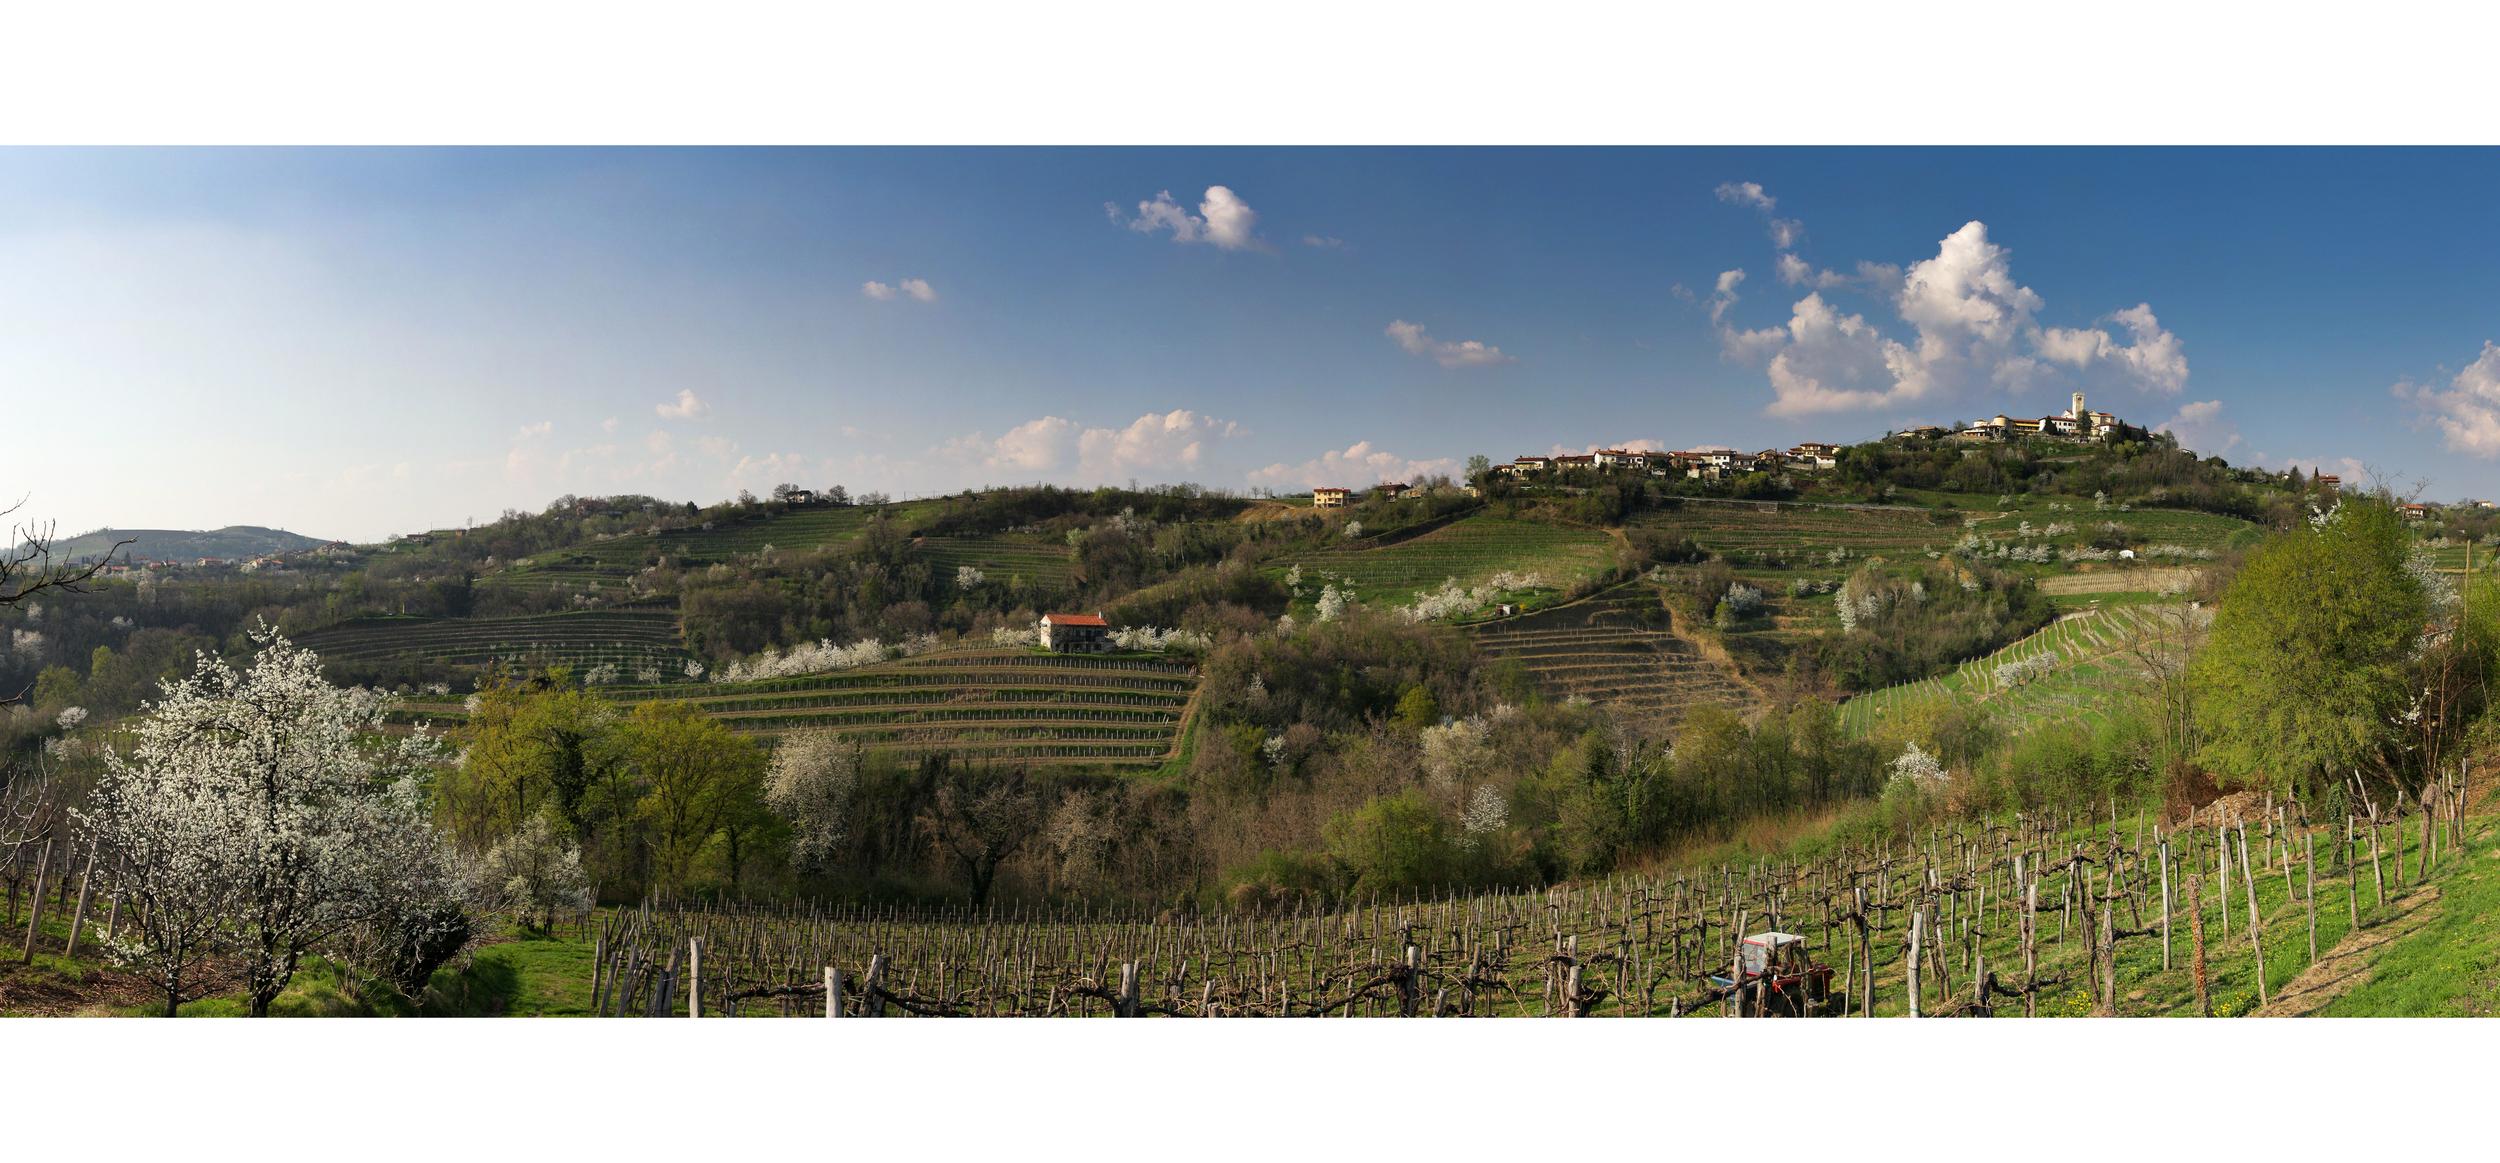 Goriška Brda is a stunningly beautiful wine region, close to Slovenia's border with Italy